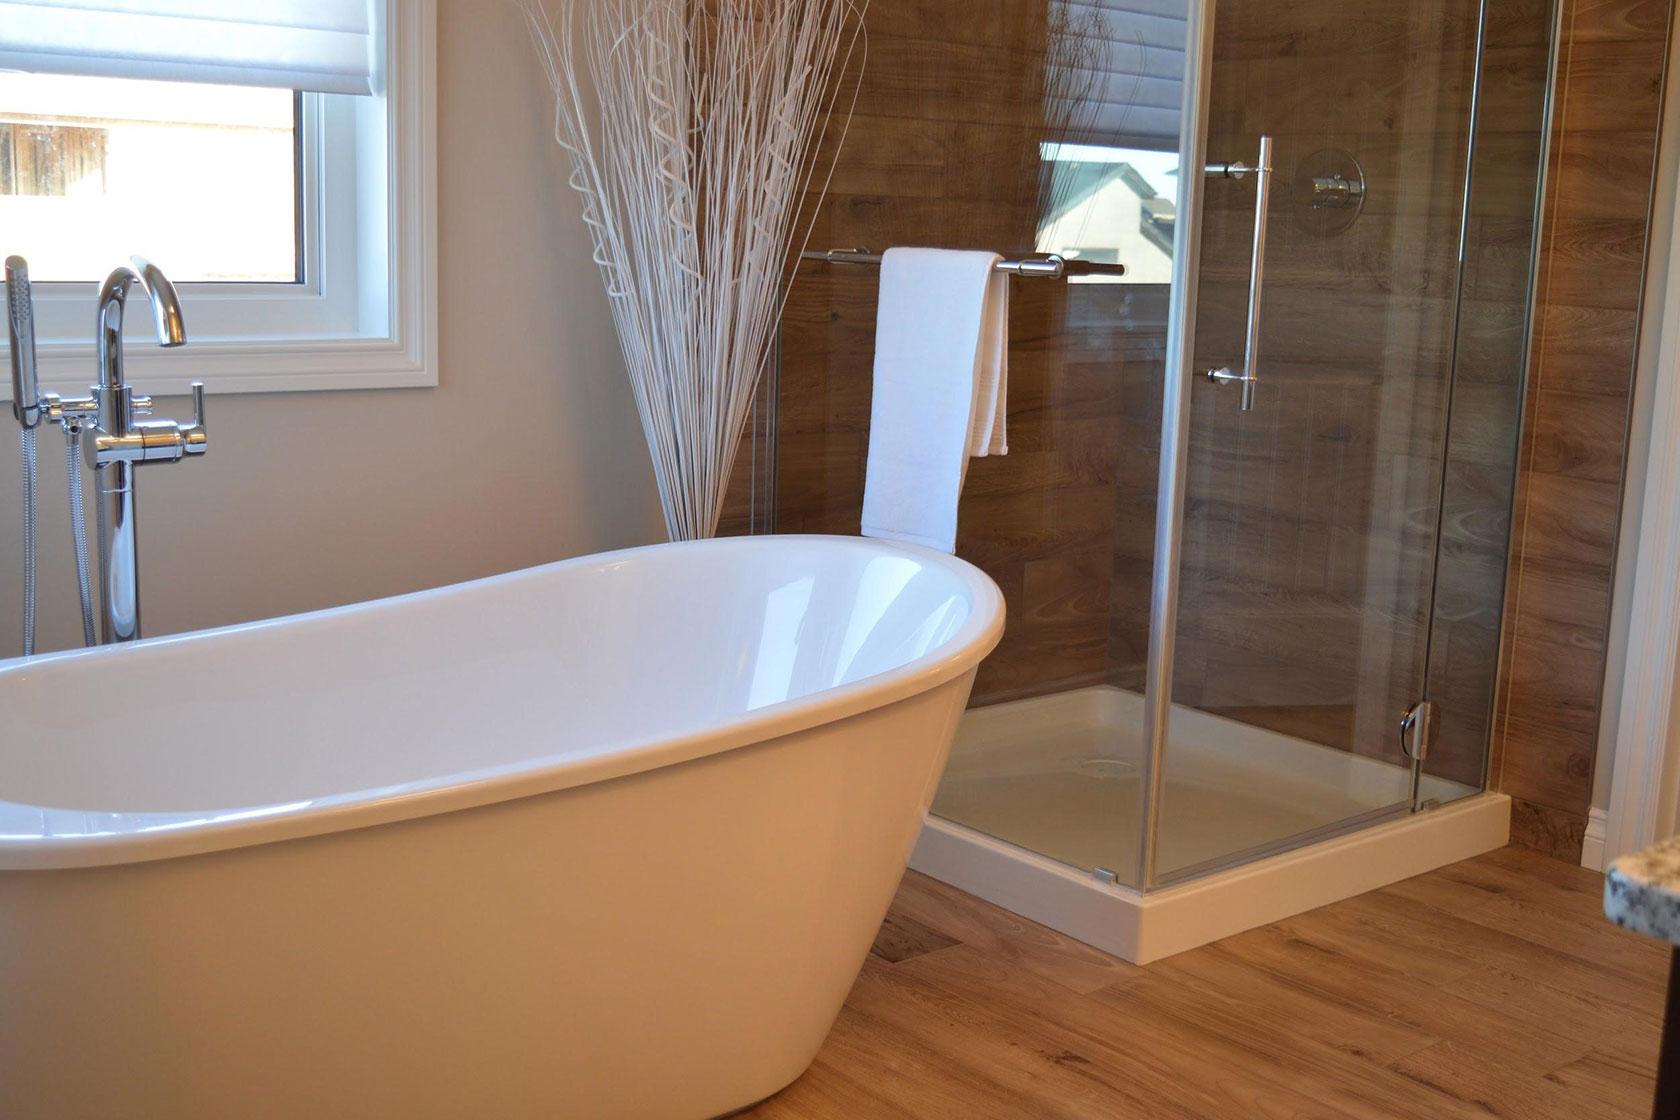 Engineered Wood Bathroom Floor